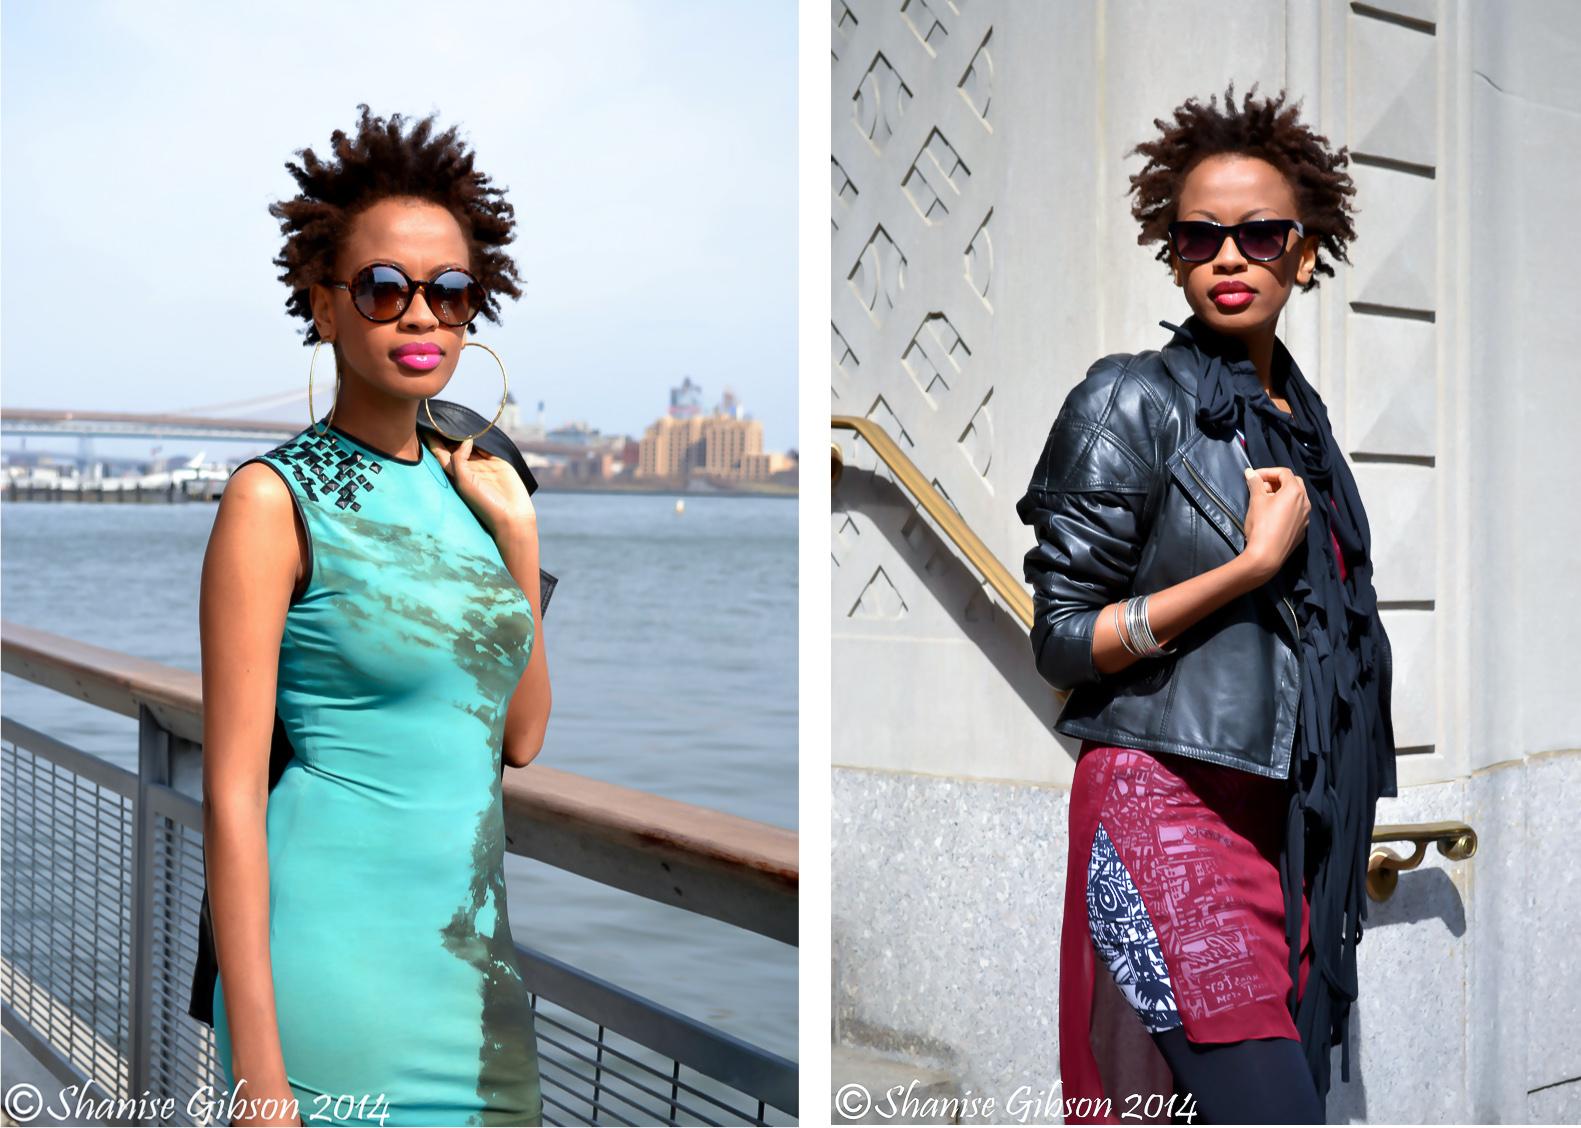 kele-mogotsi_botswanas-best-actors_best-actresses-botswana_the-last-of-us-film_new-york-based-batswana_kelebogile-mogotsi_afro-hair-models-new-york_natural-hair-inspiration-botswana-4